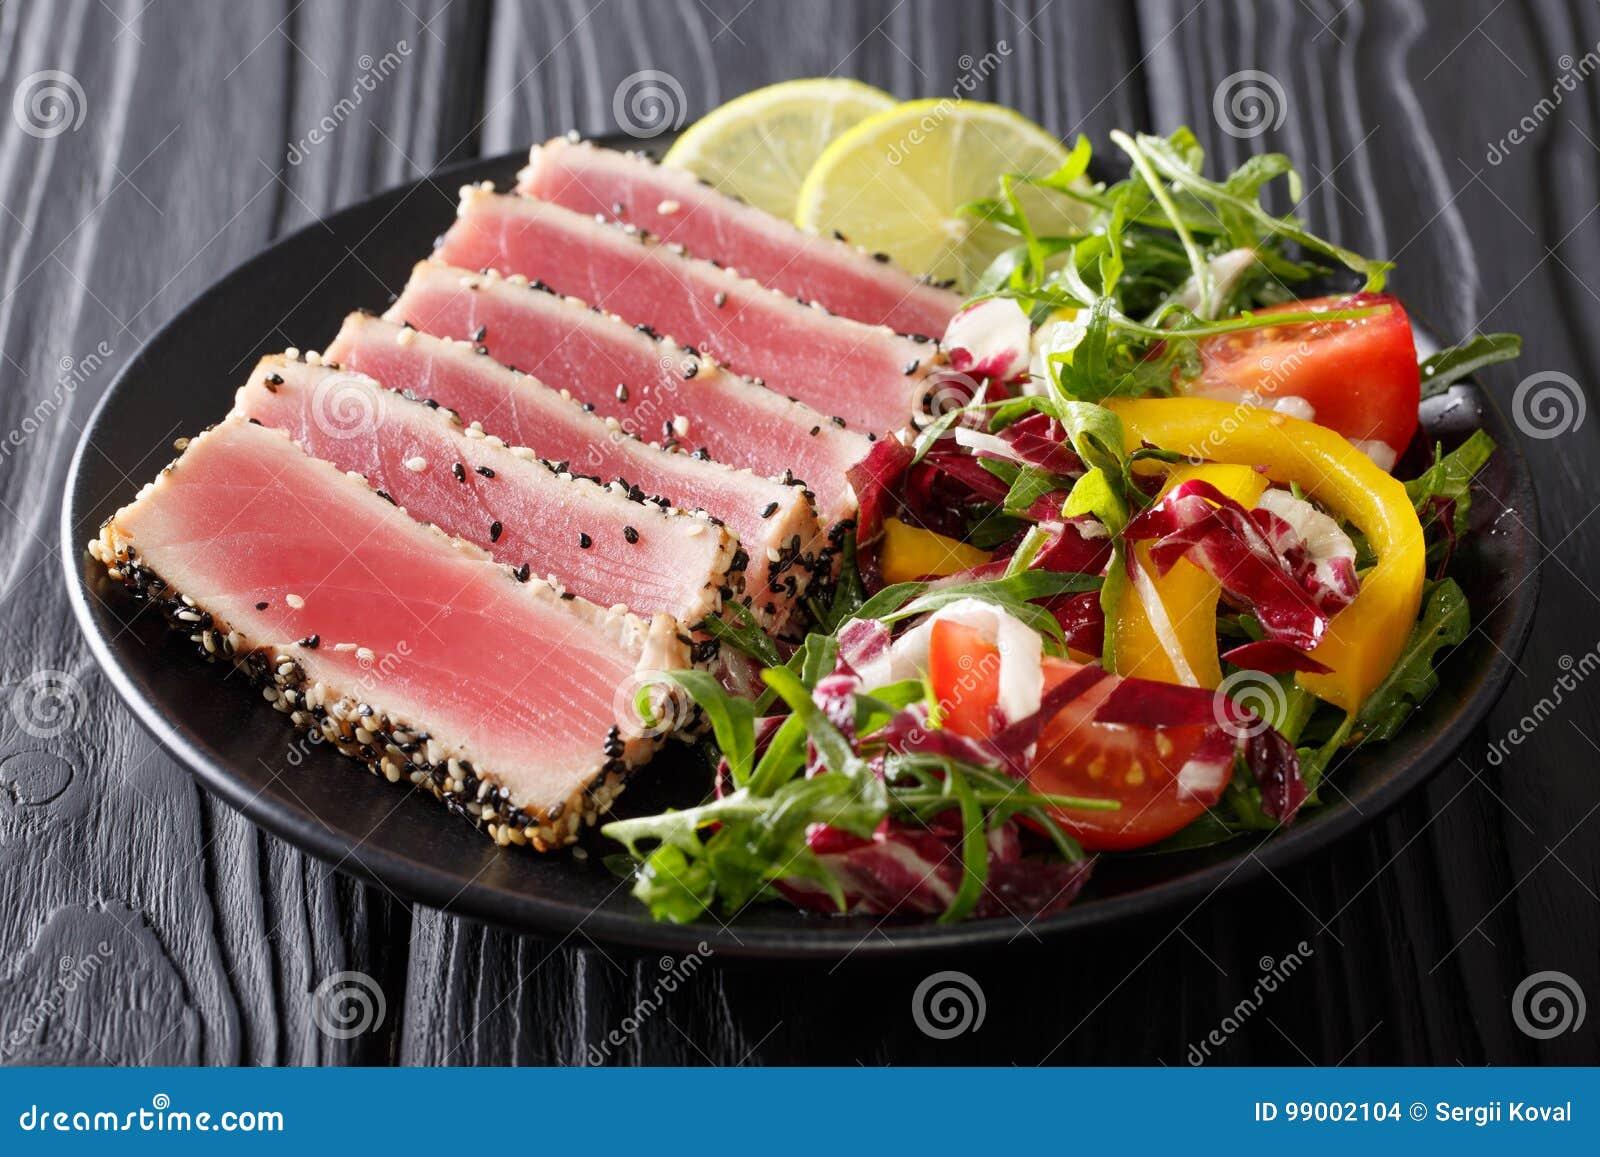 Beautiful food: steak tuna in sesame, lime and fresh salad close